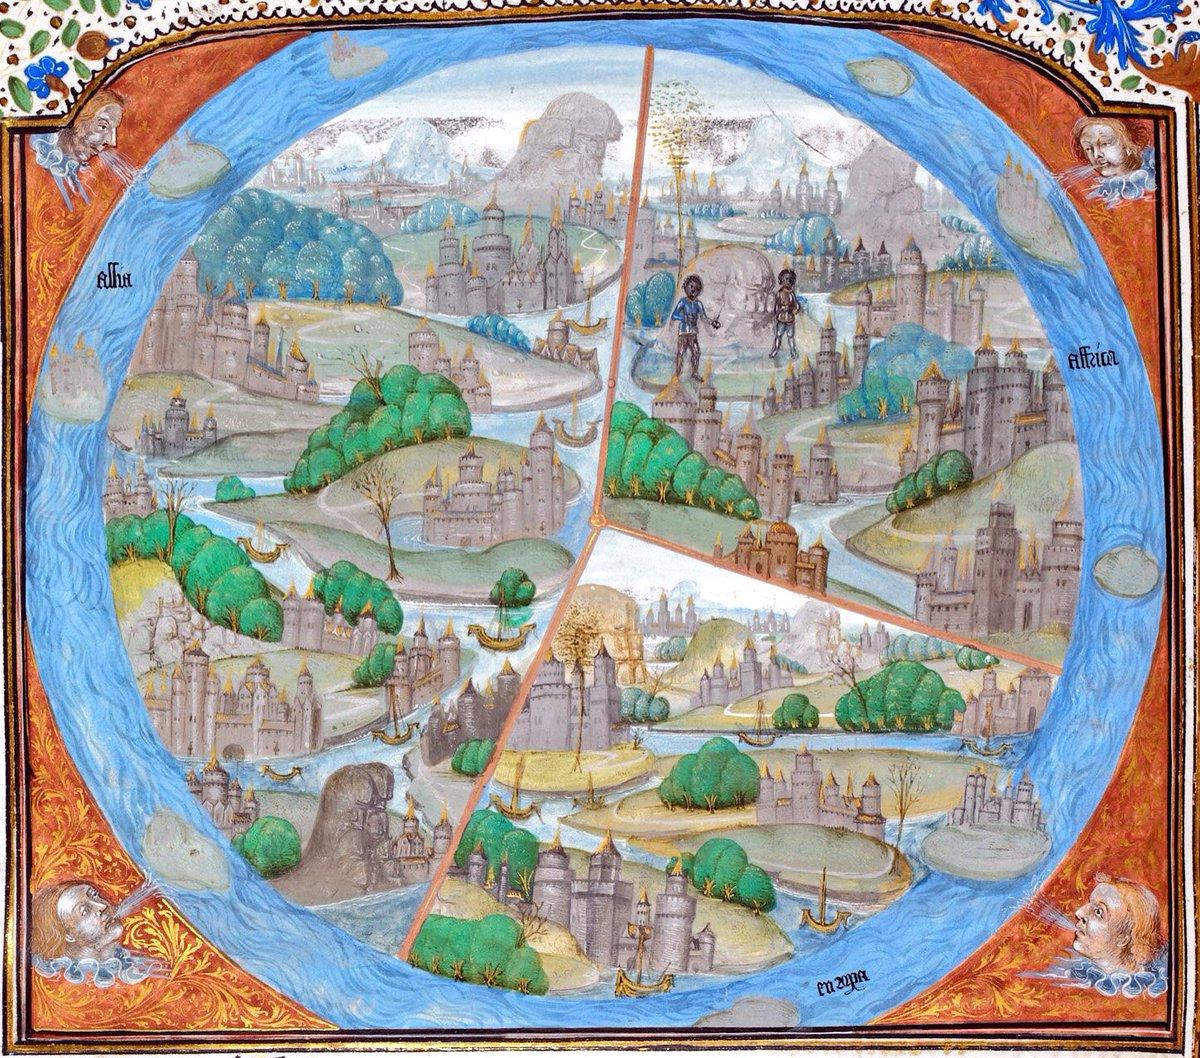 Map Of The World Before Columbus.Johan Oosterman On Twitter The World Before Columbus And Mercator